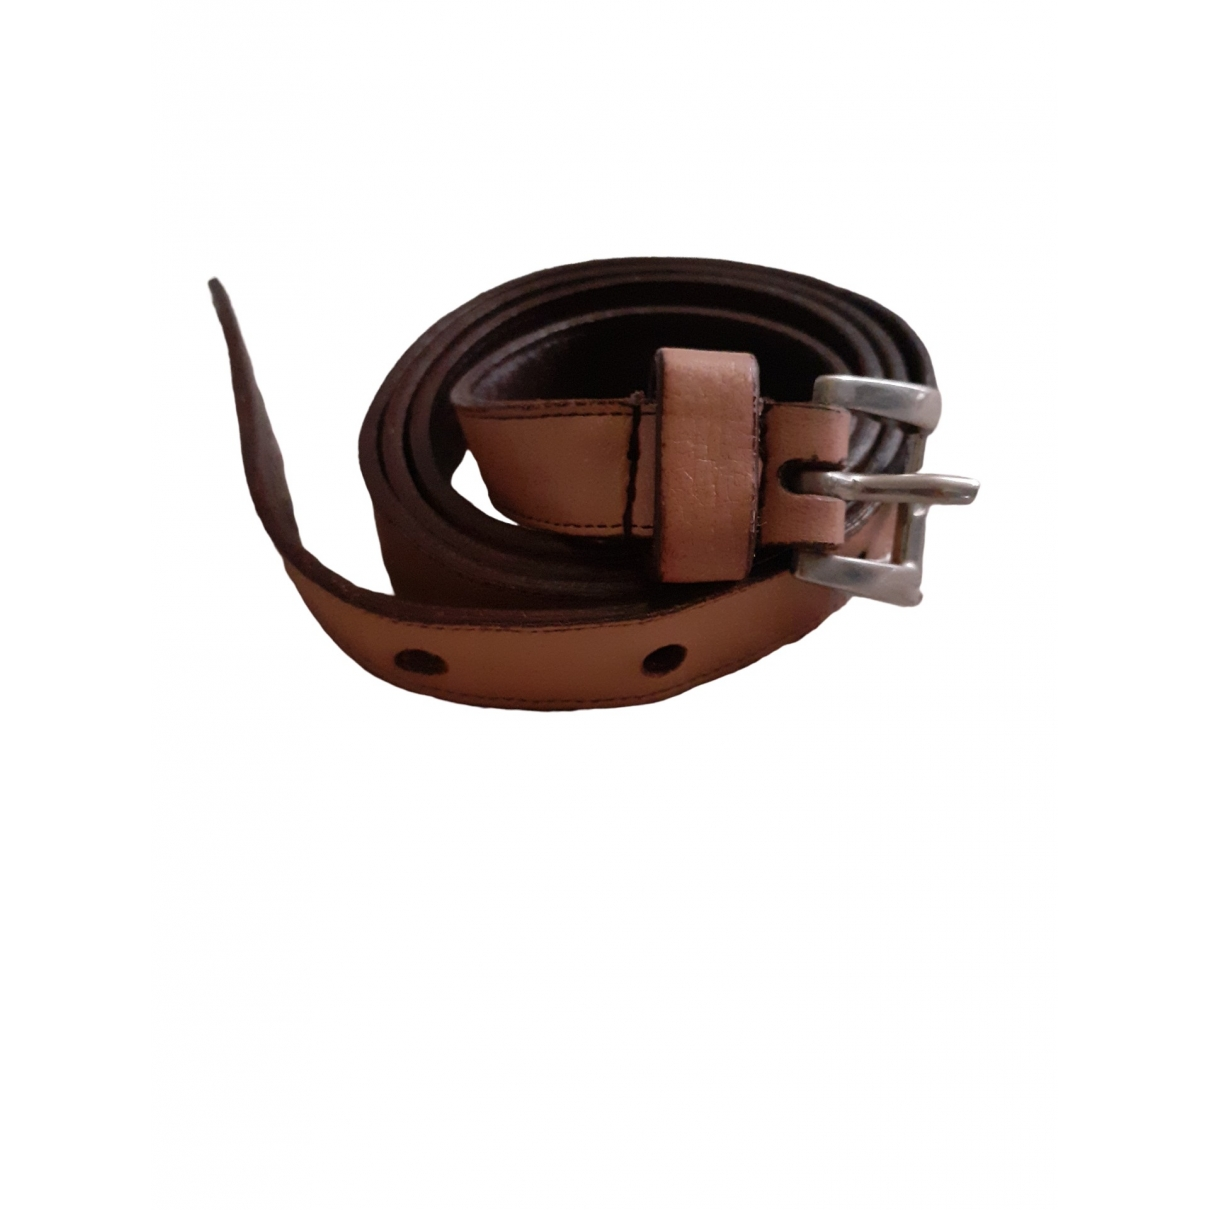 Prada \N Pink Leather belt for Women XS International